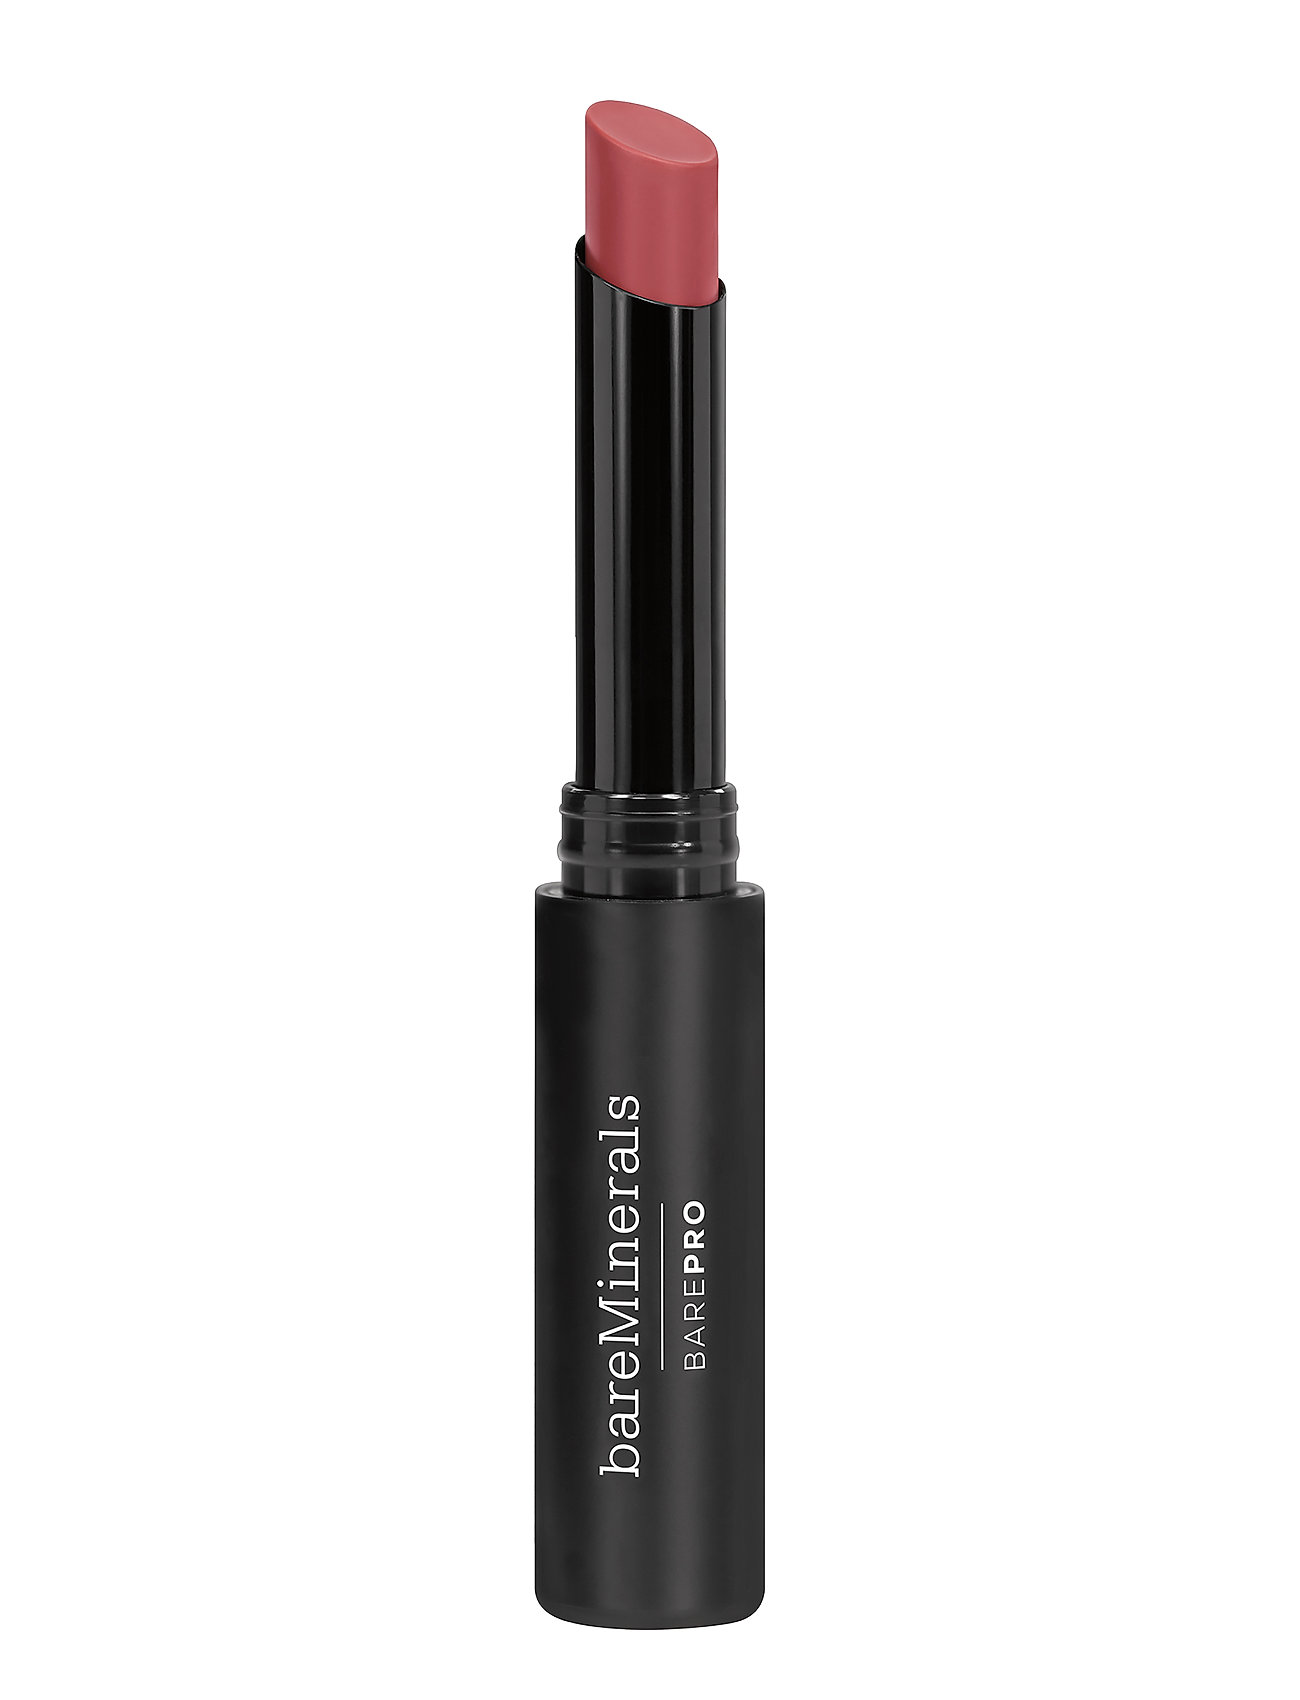 Image of Barepro Longwear Lipstick Bloom Læbestift Makeup Lyserød BareMinerals (3138616945)